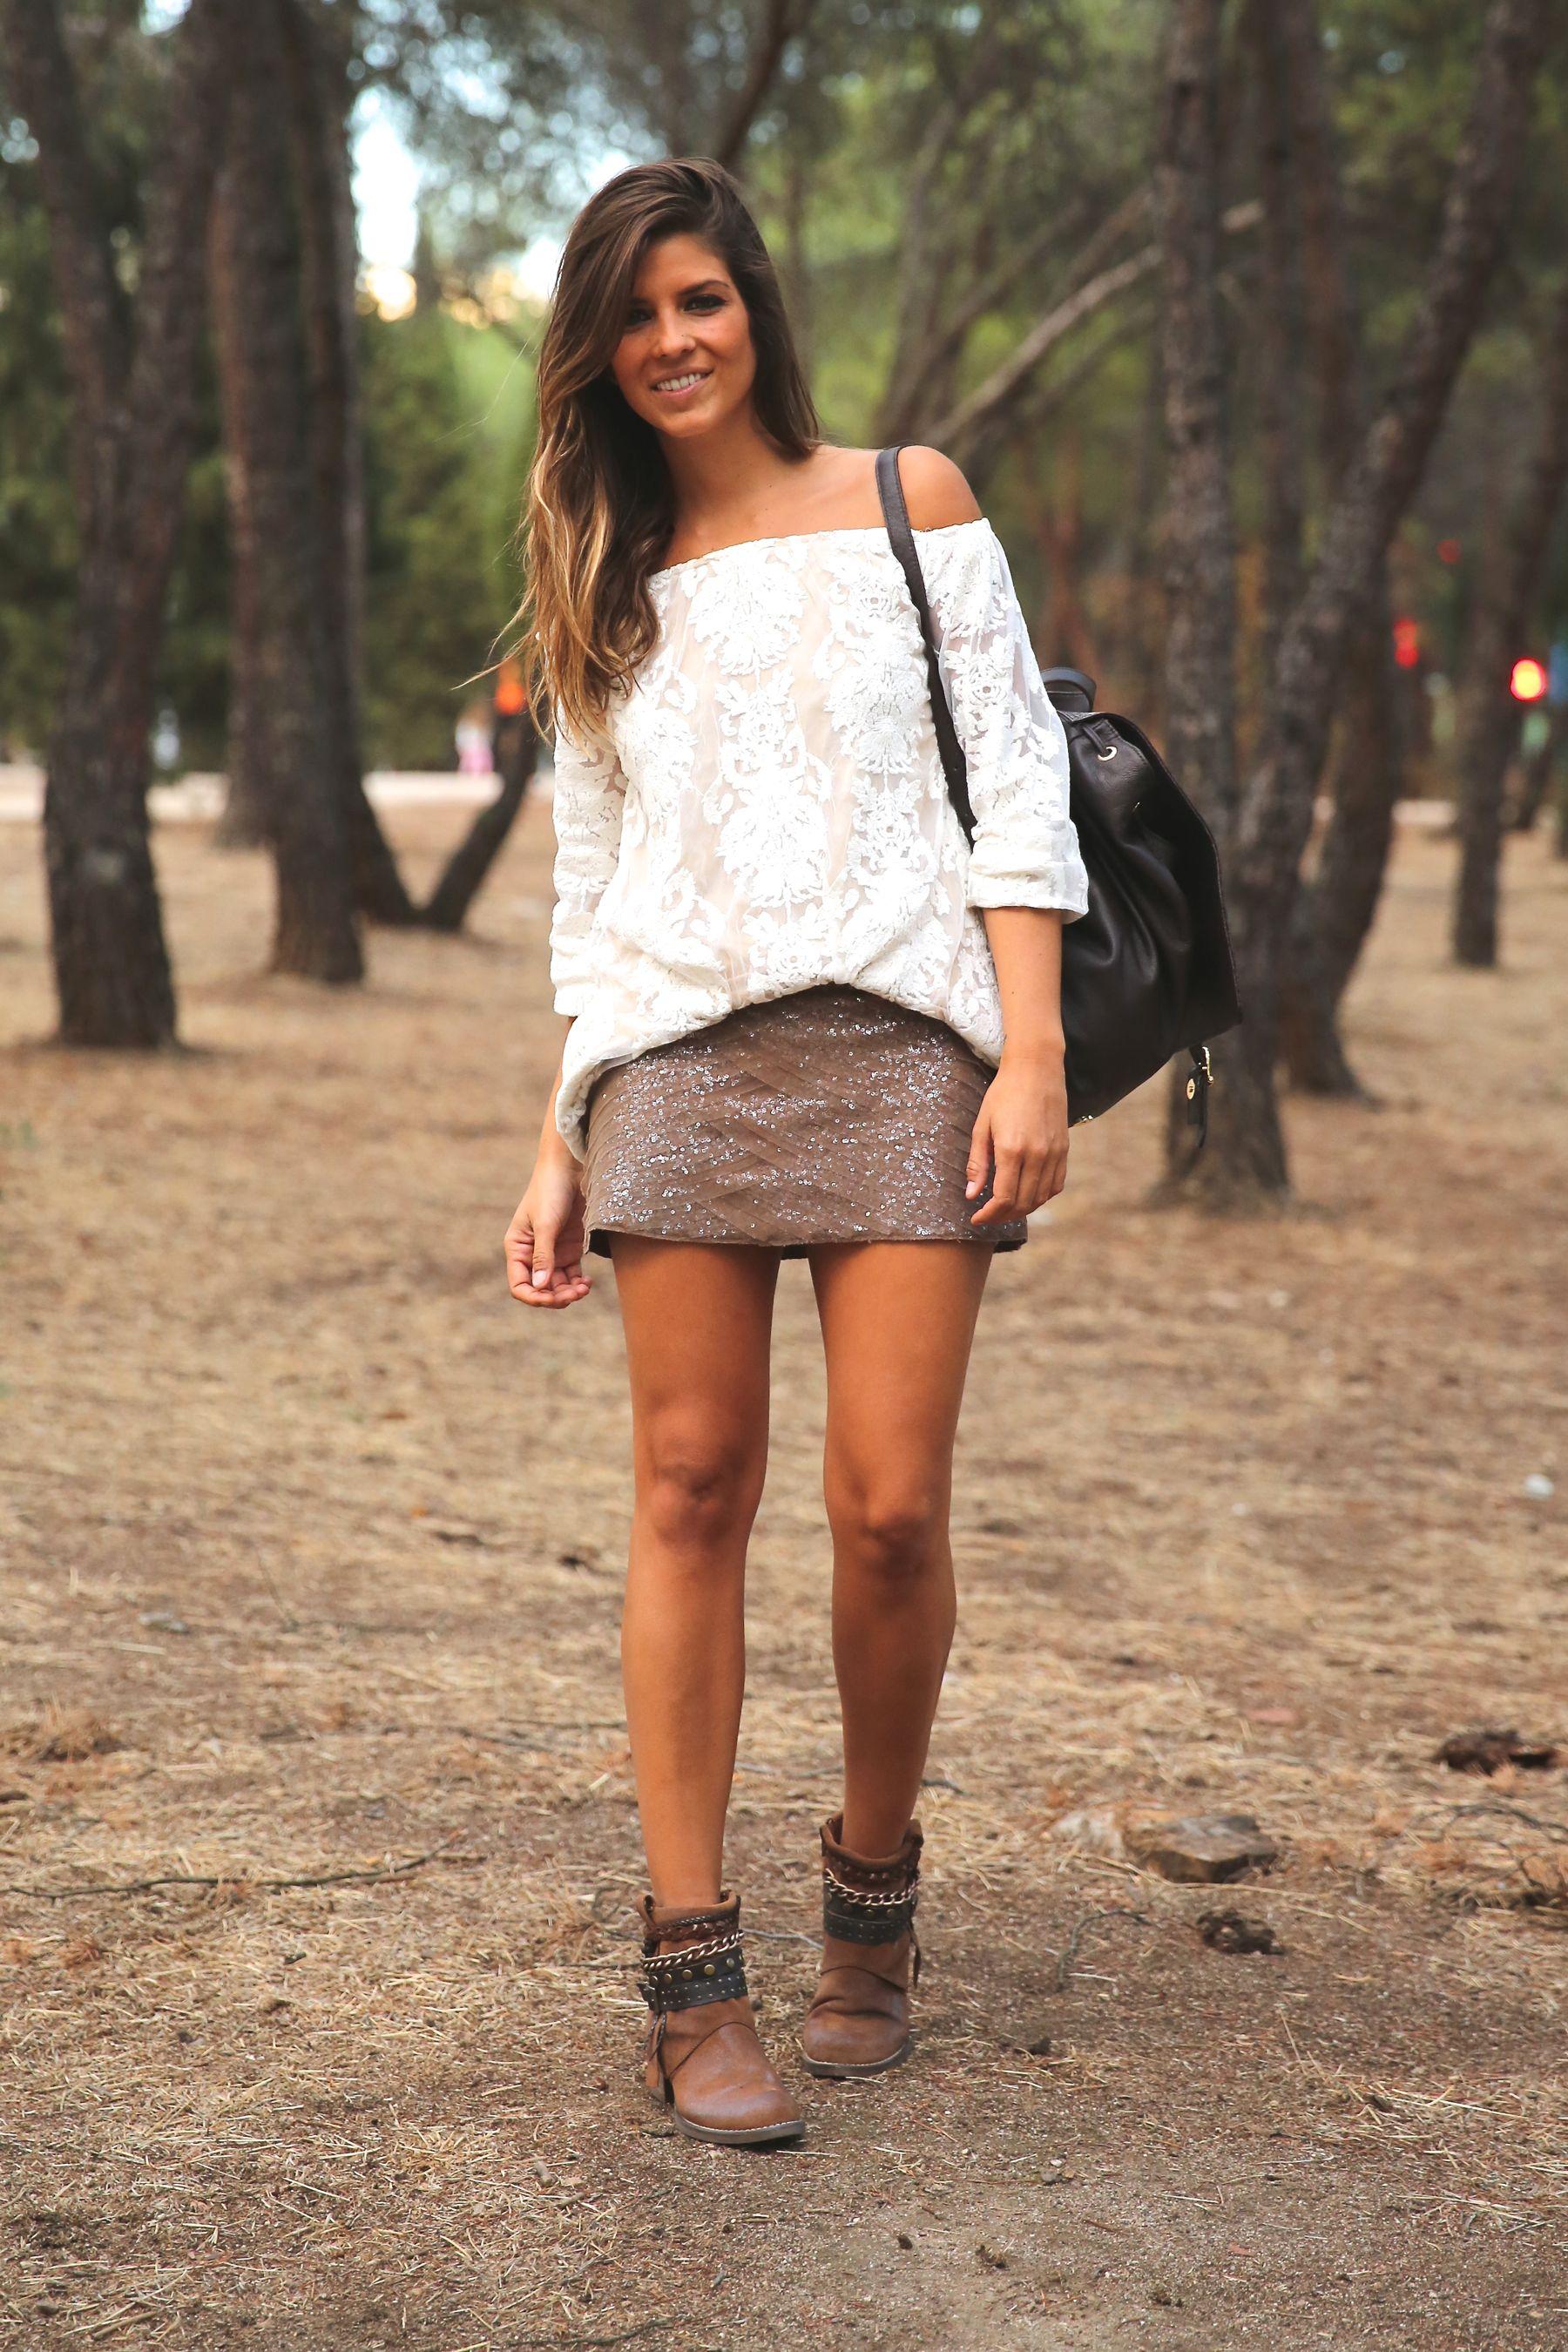 trendy_taste-look-outfit-street_style-ootd-blog-blogger-fashion_spain-moda_españa-primavera/verano-boho-trendy-planes_de_día-lentejuelas-falda-botines-étnico-mochila-crochet-encaje-13